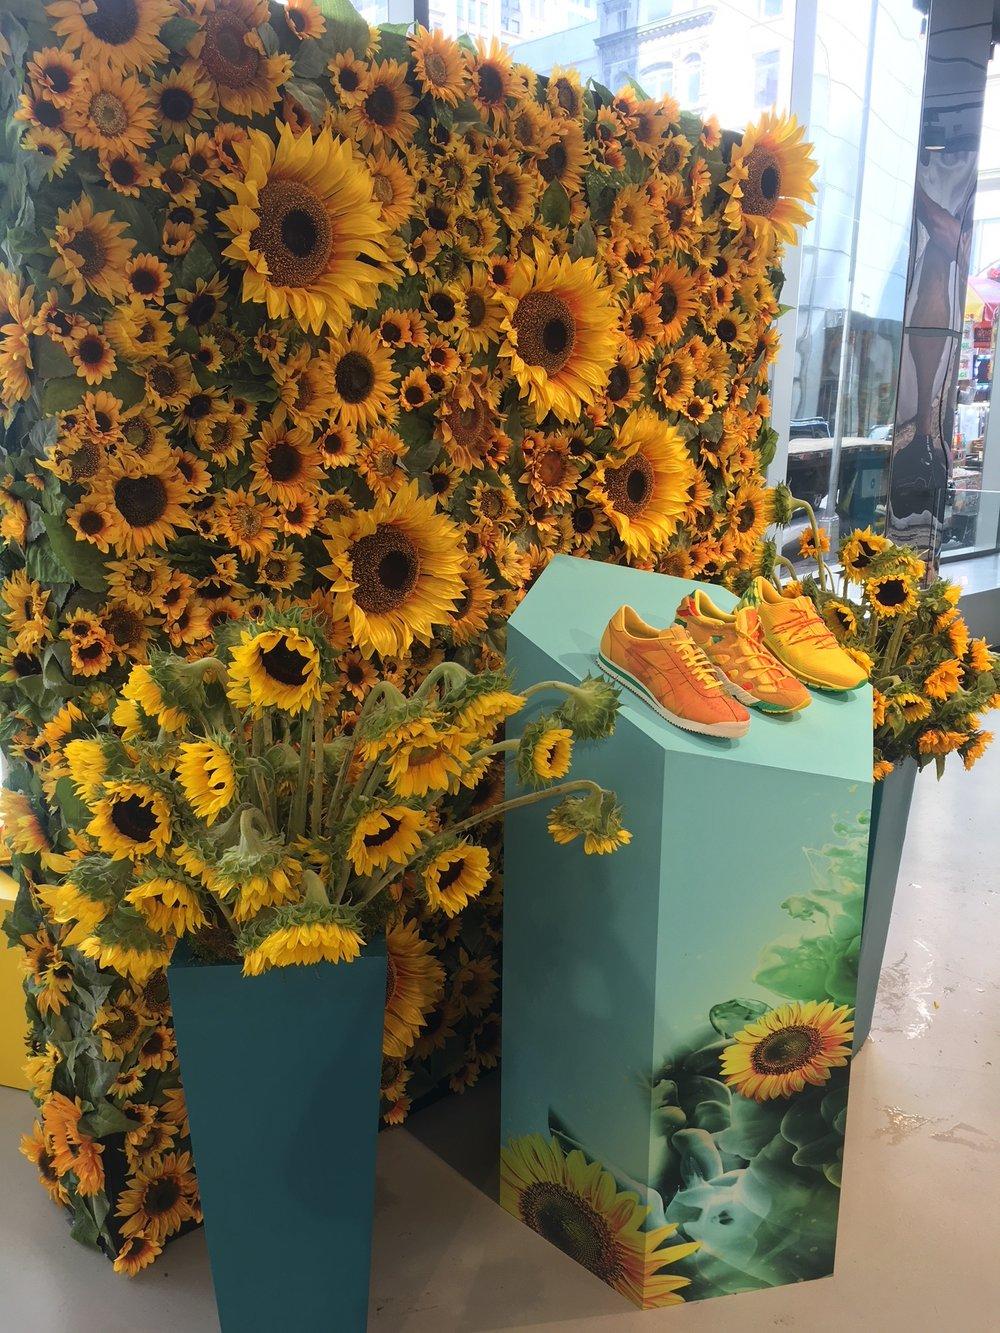 ASICS Sunflower Campaign - NYC & LA